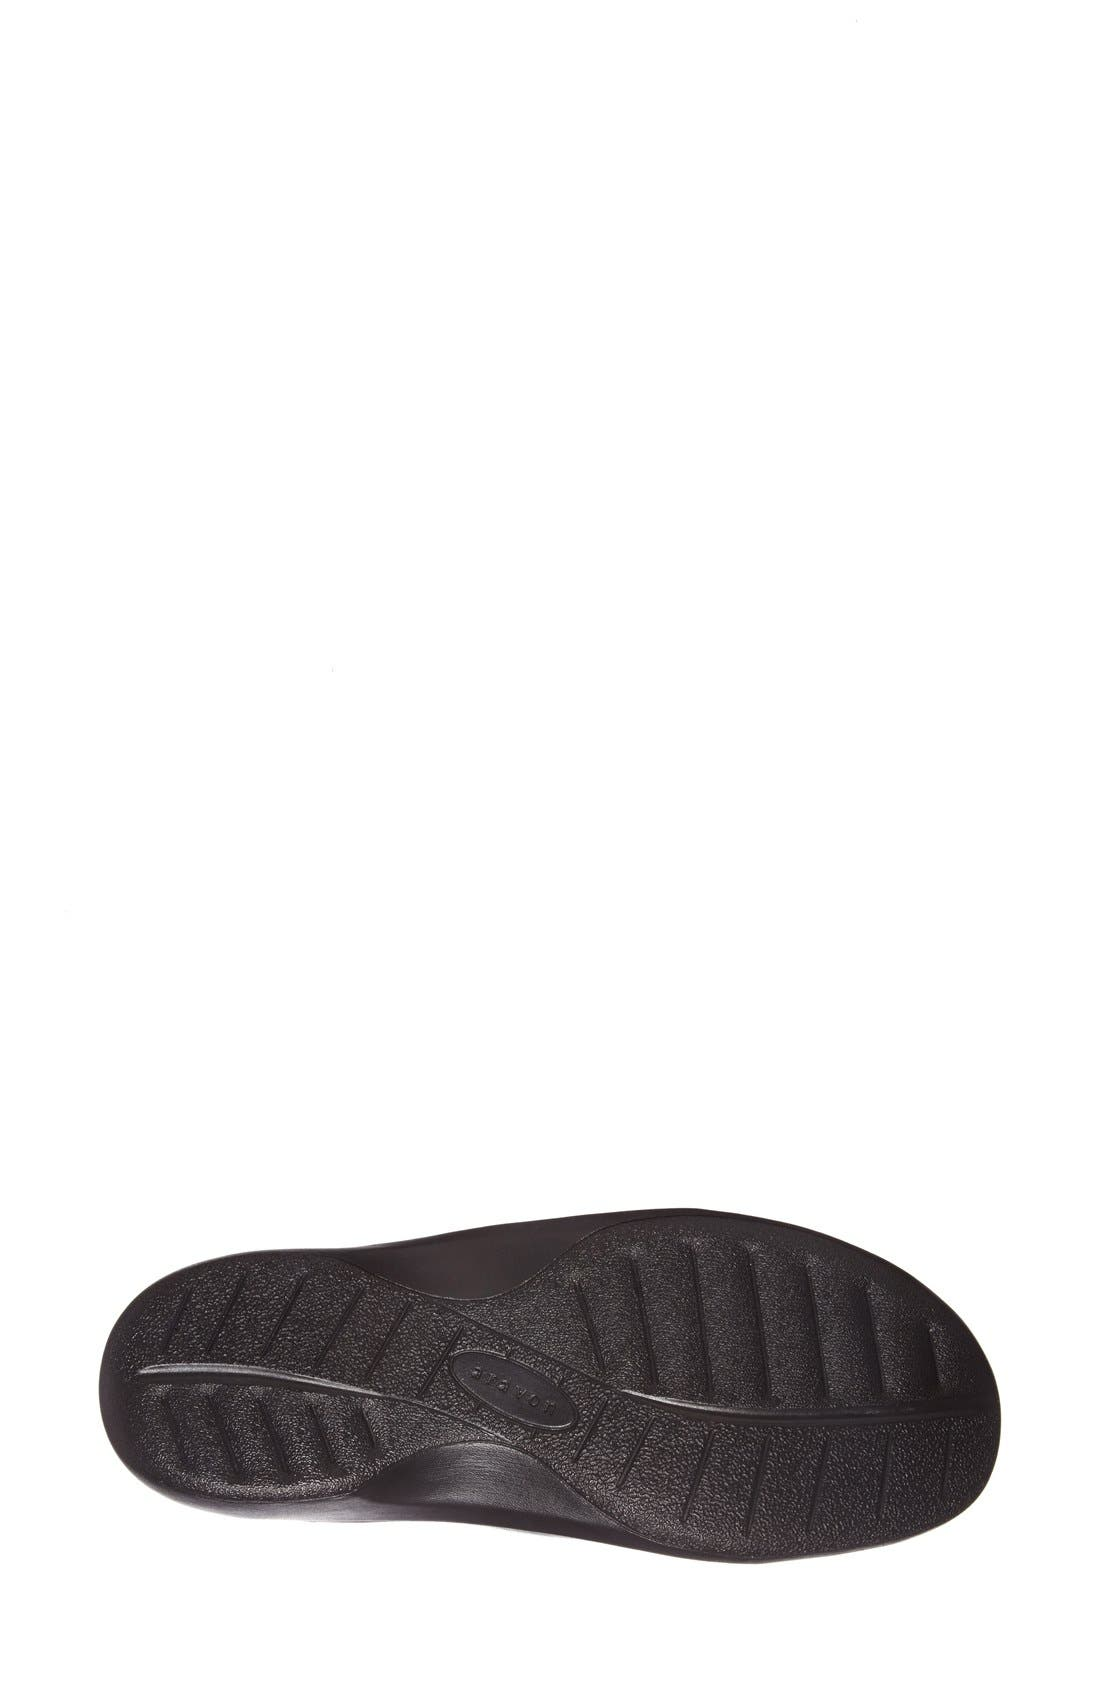 Alternate Image 4  - Aravon 'Danielle' Loafer Flat (Women)